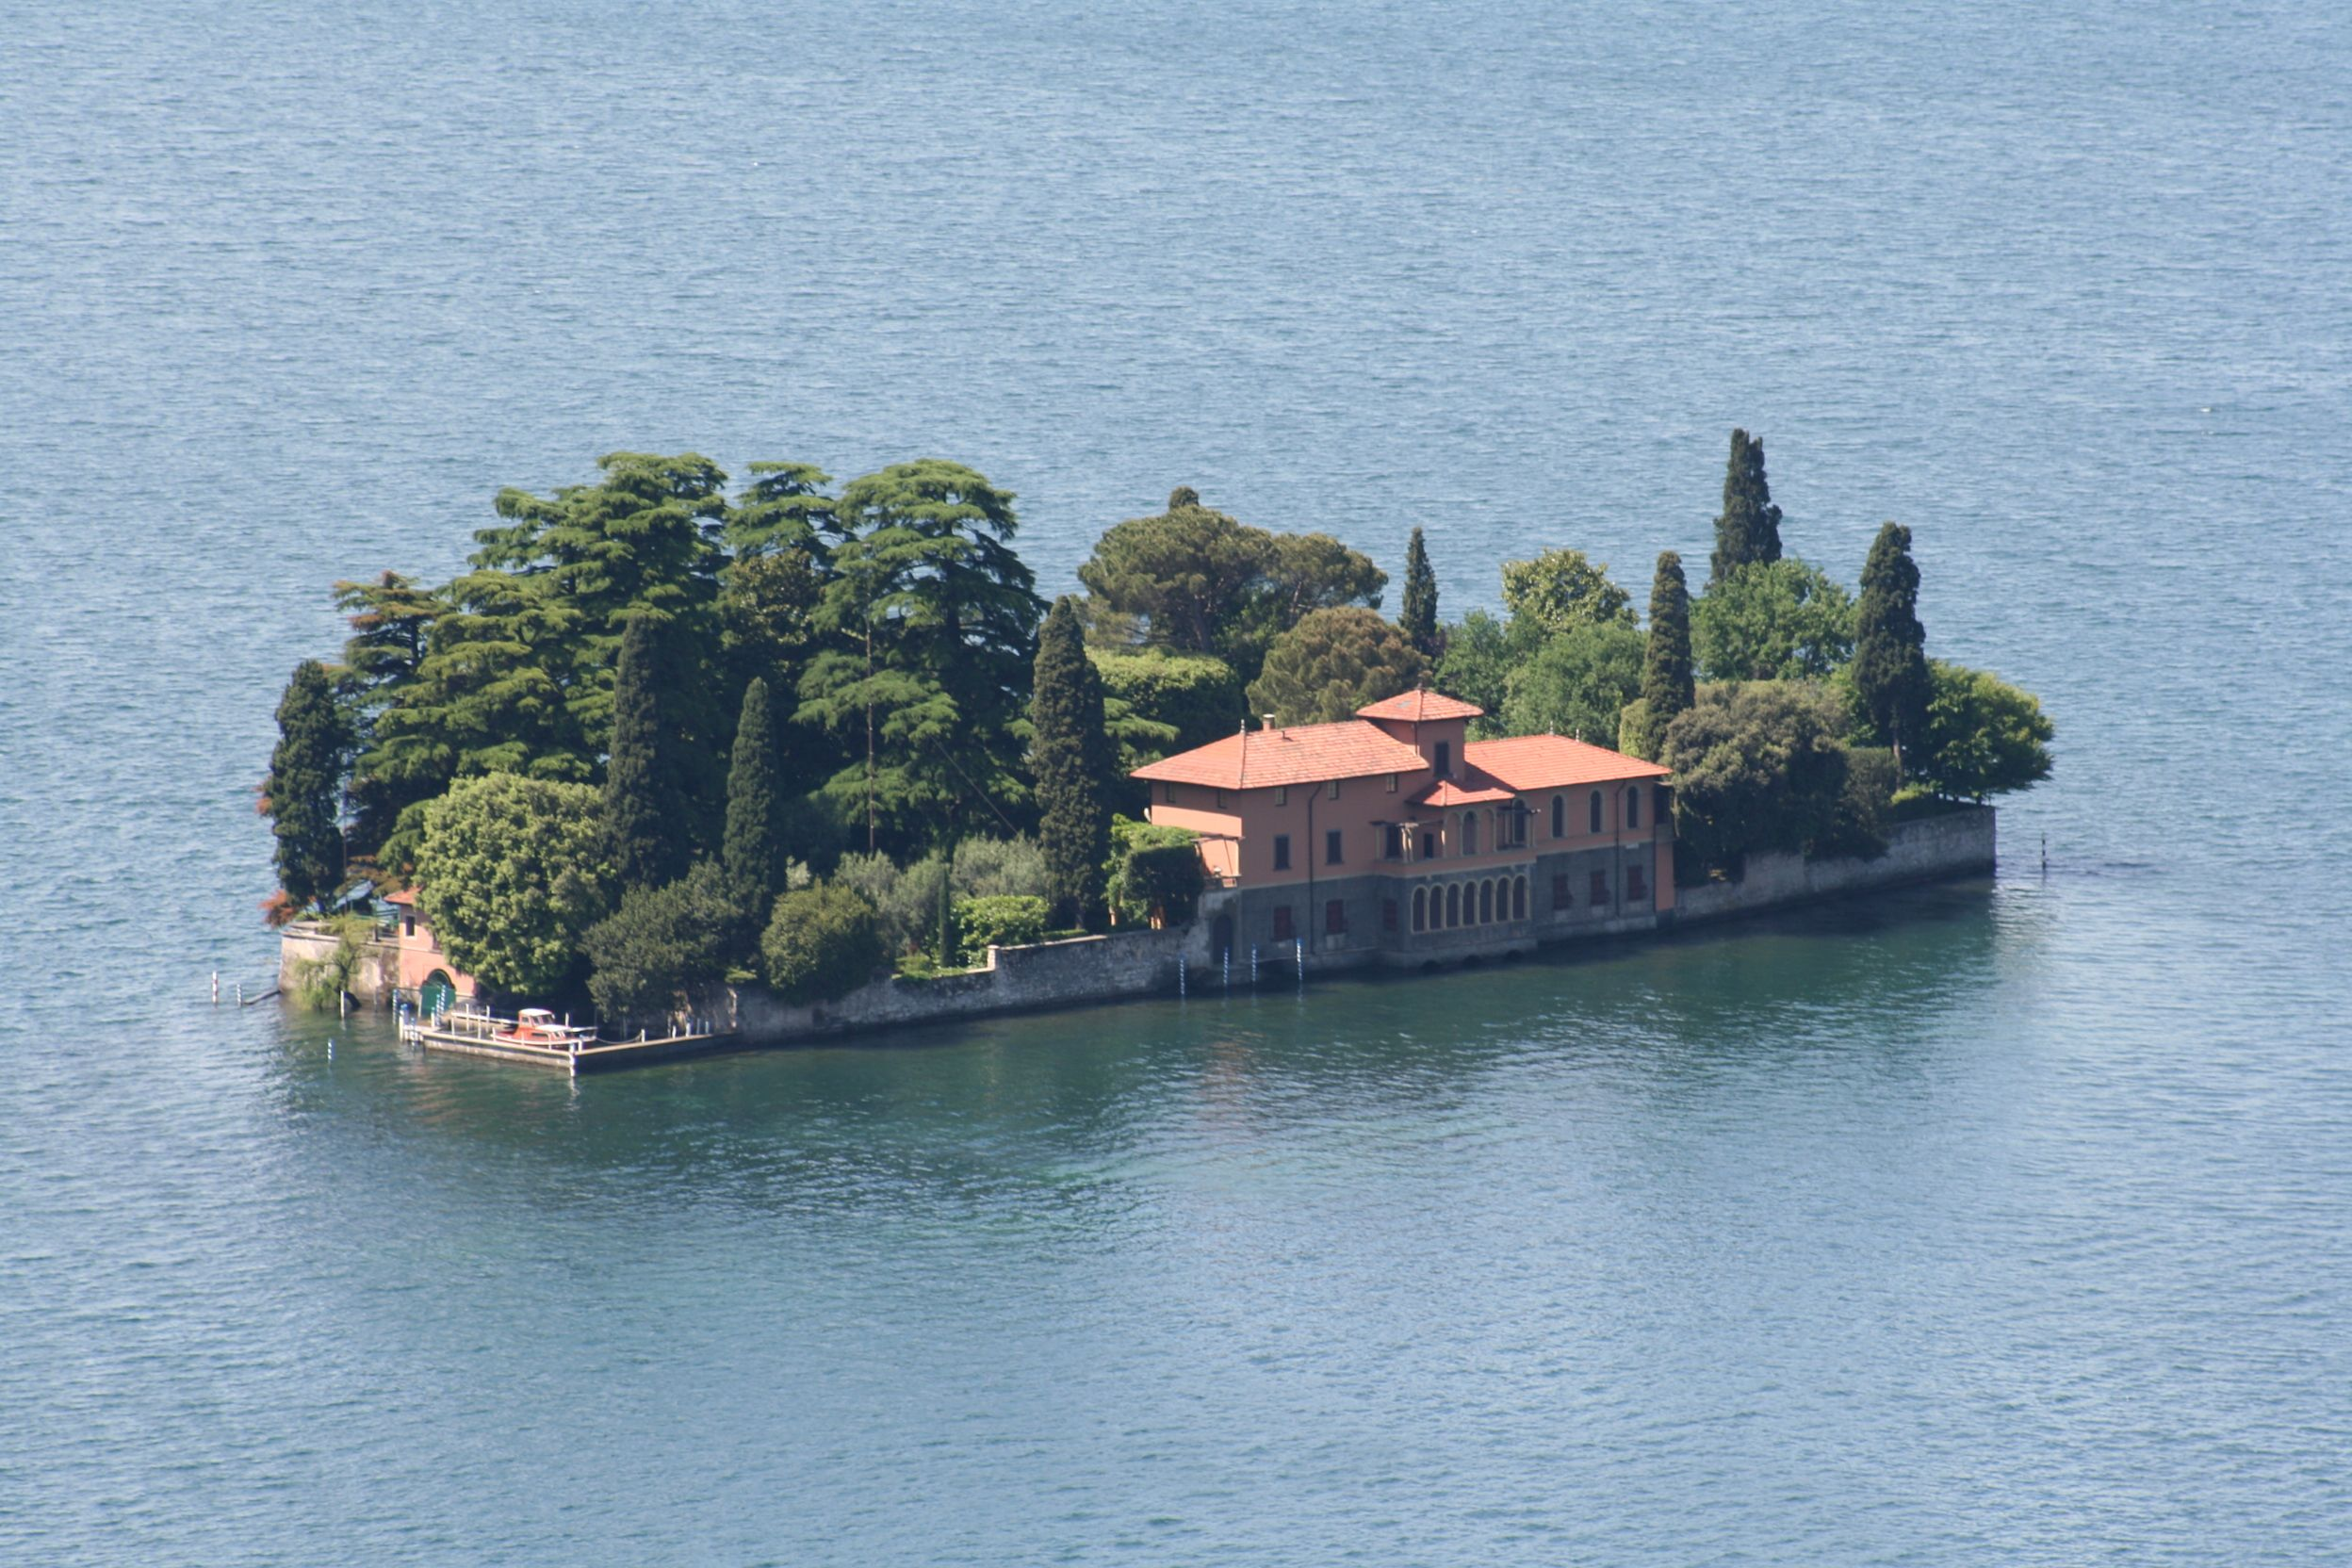 Photo Gallery - Barcaioli Monteisola Iseo - Navigazione Lago d'Iseo - Servizi Hotel - Trasporti per Monteisola - Floating Piers Christo - Pontili galleggianti